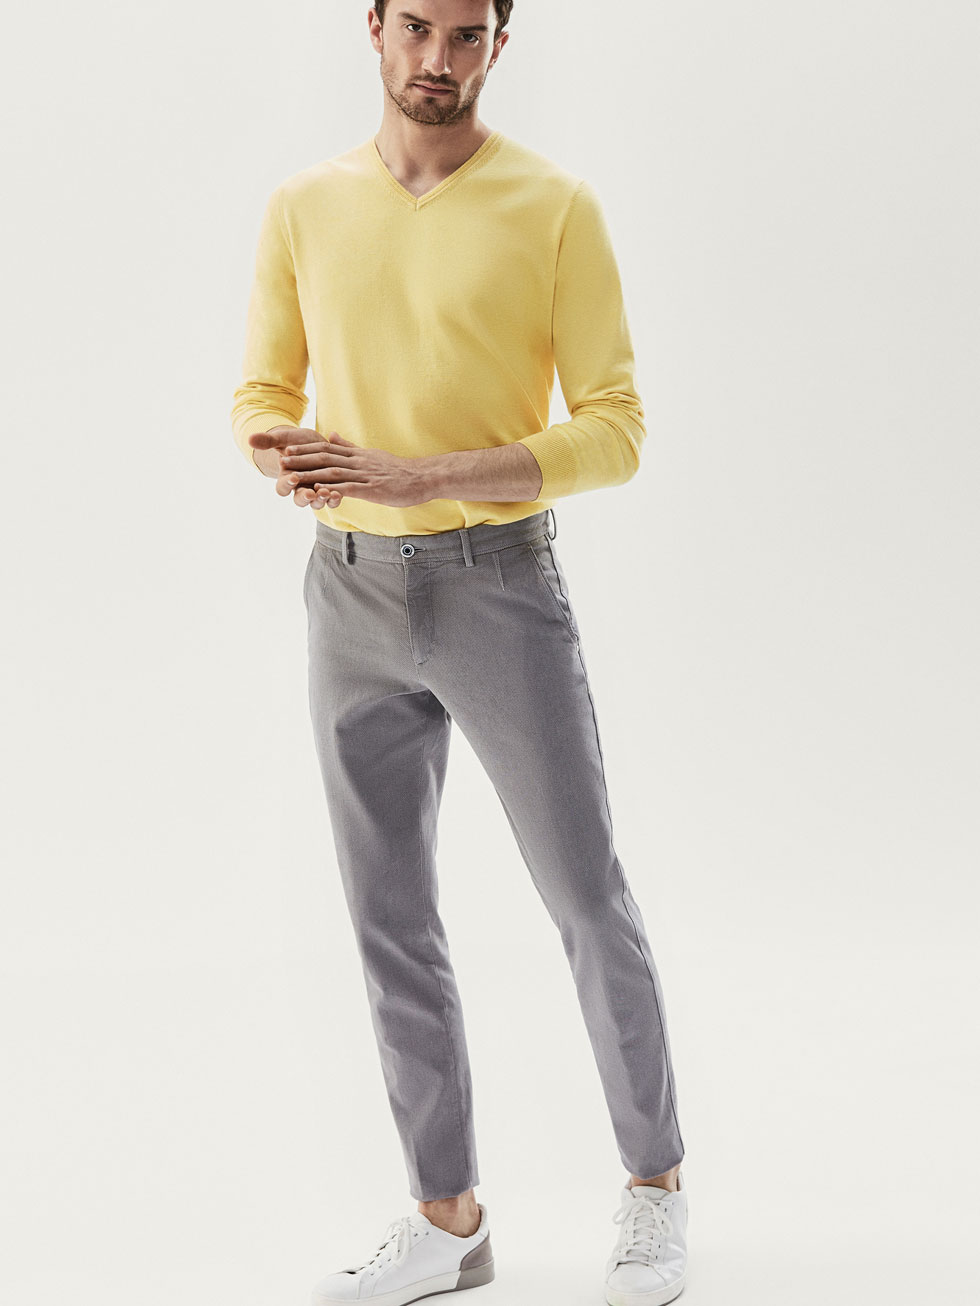 Chinos - Trousers - MEN - Massimo Dutti